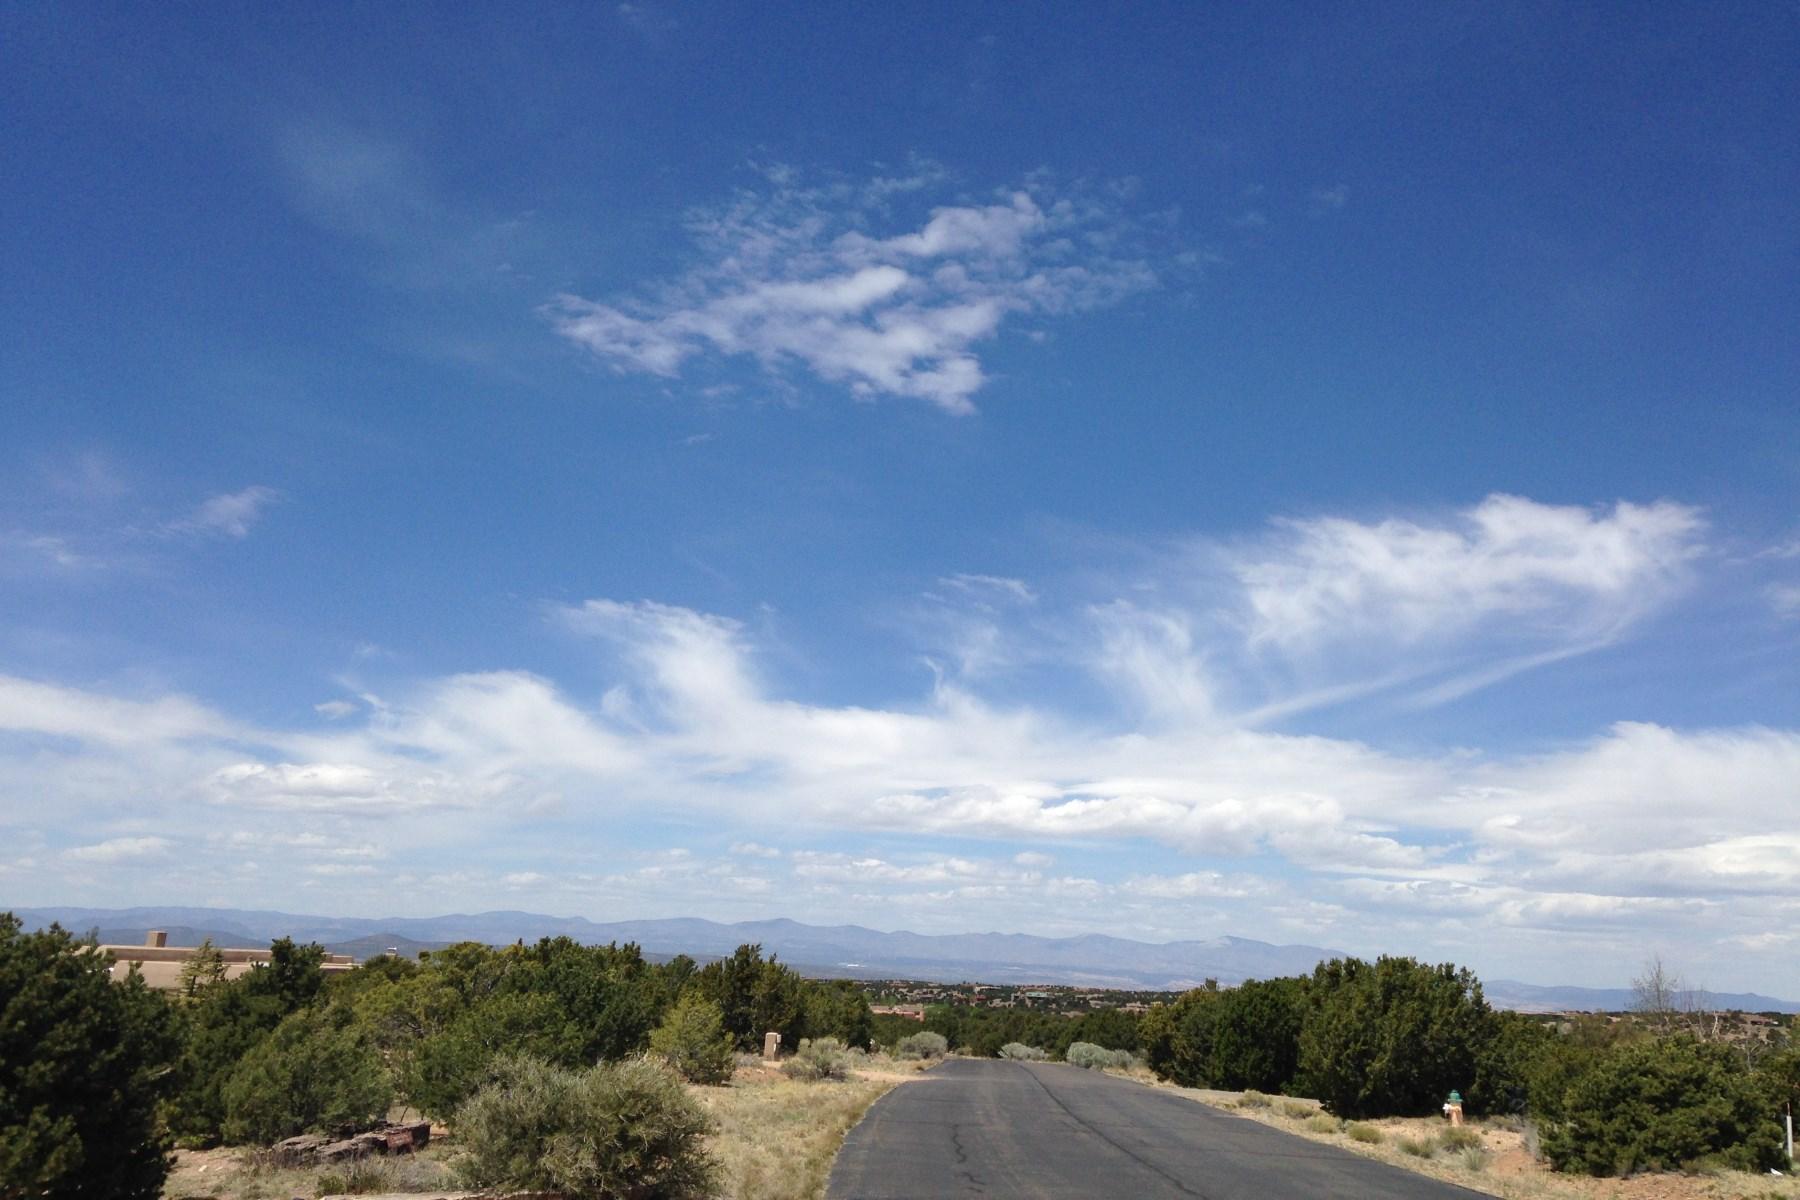 Land for Sale at 3165 Vista Sandia, Lot 69 Northwest Of City Limits, Santa Fe, New Mexico, 87501 United States